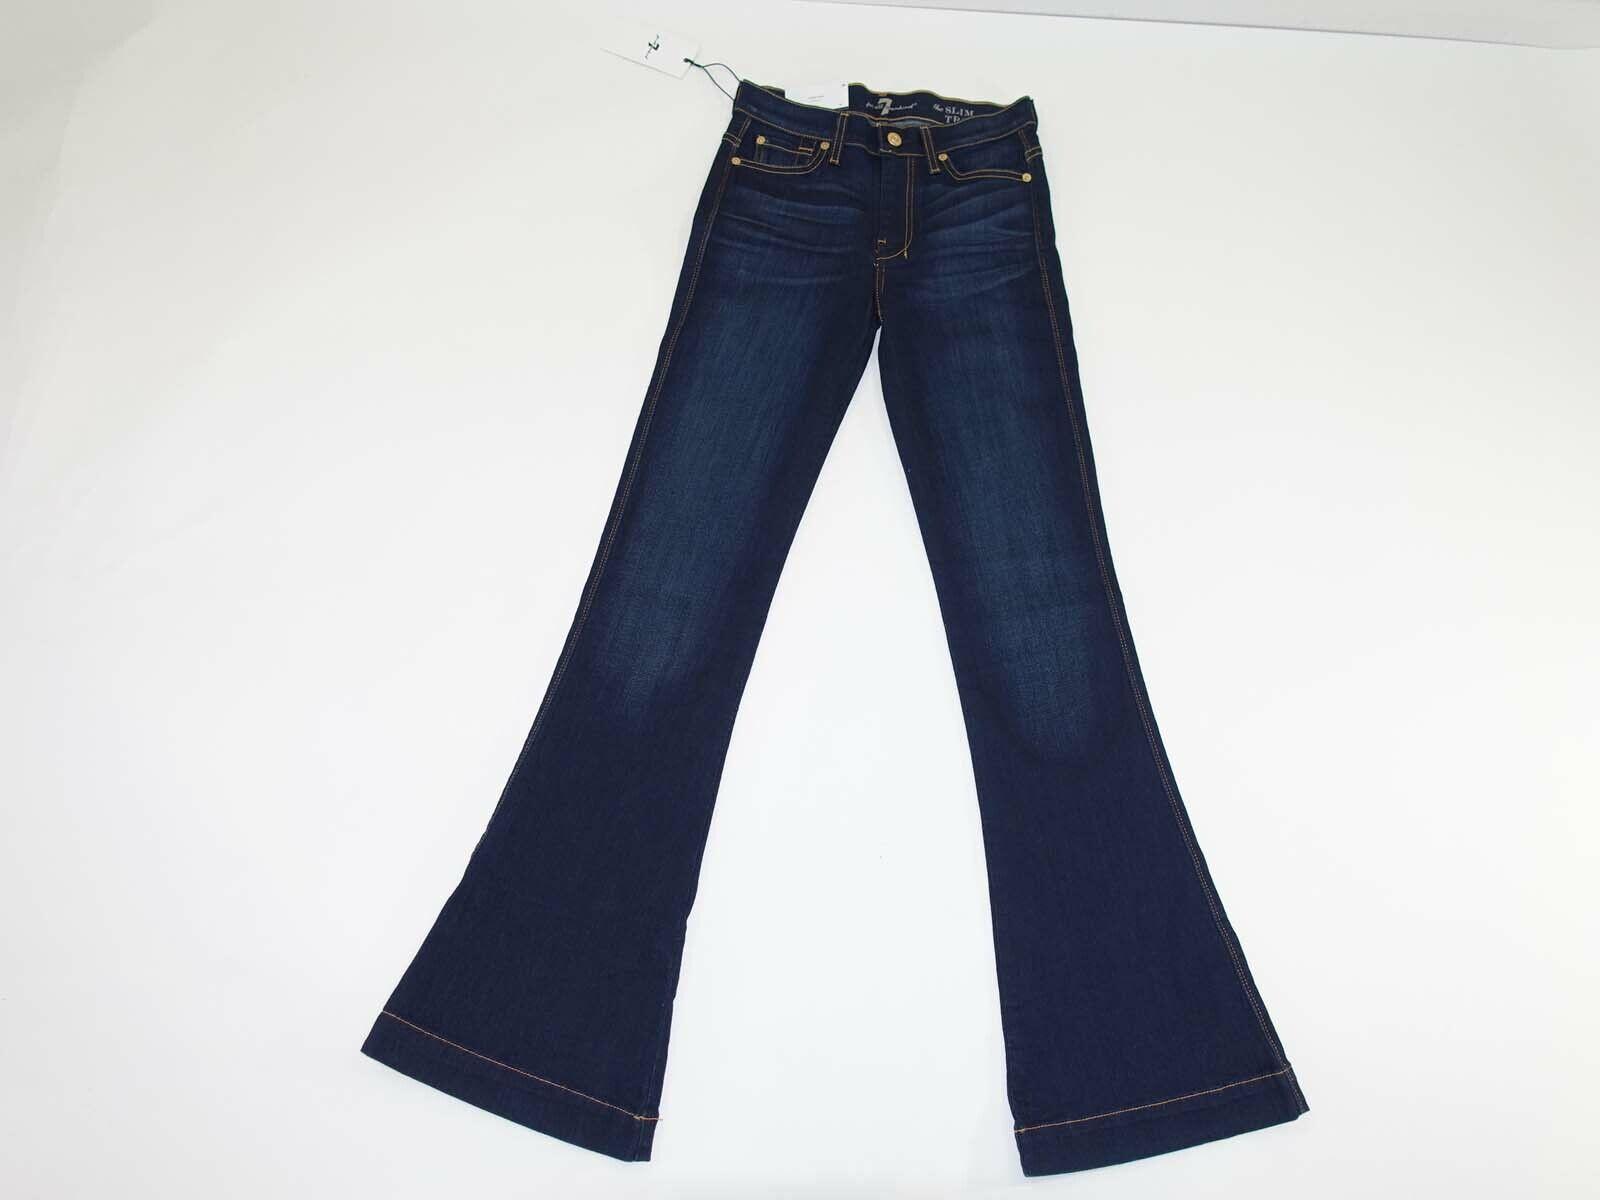 7 For All Mankind Damen Schmal Hose Jeans Größe 24 X 34 Nwt Dunkelblau